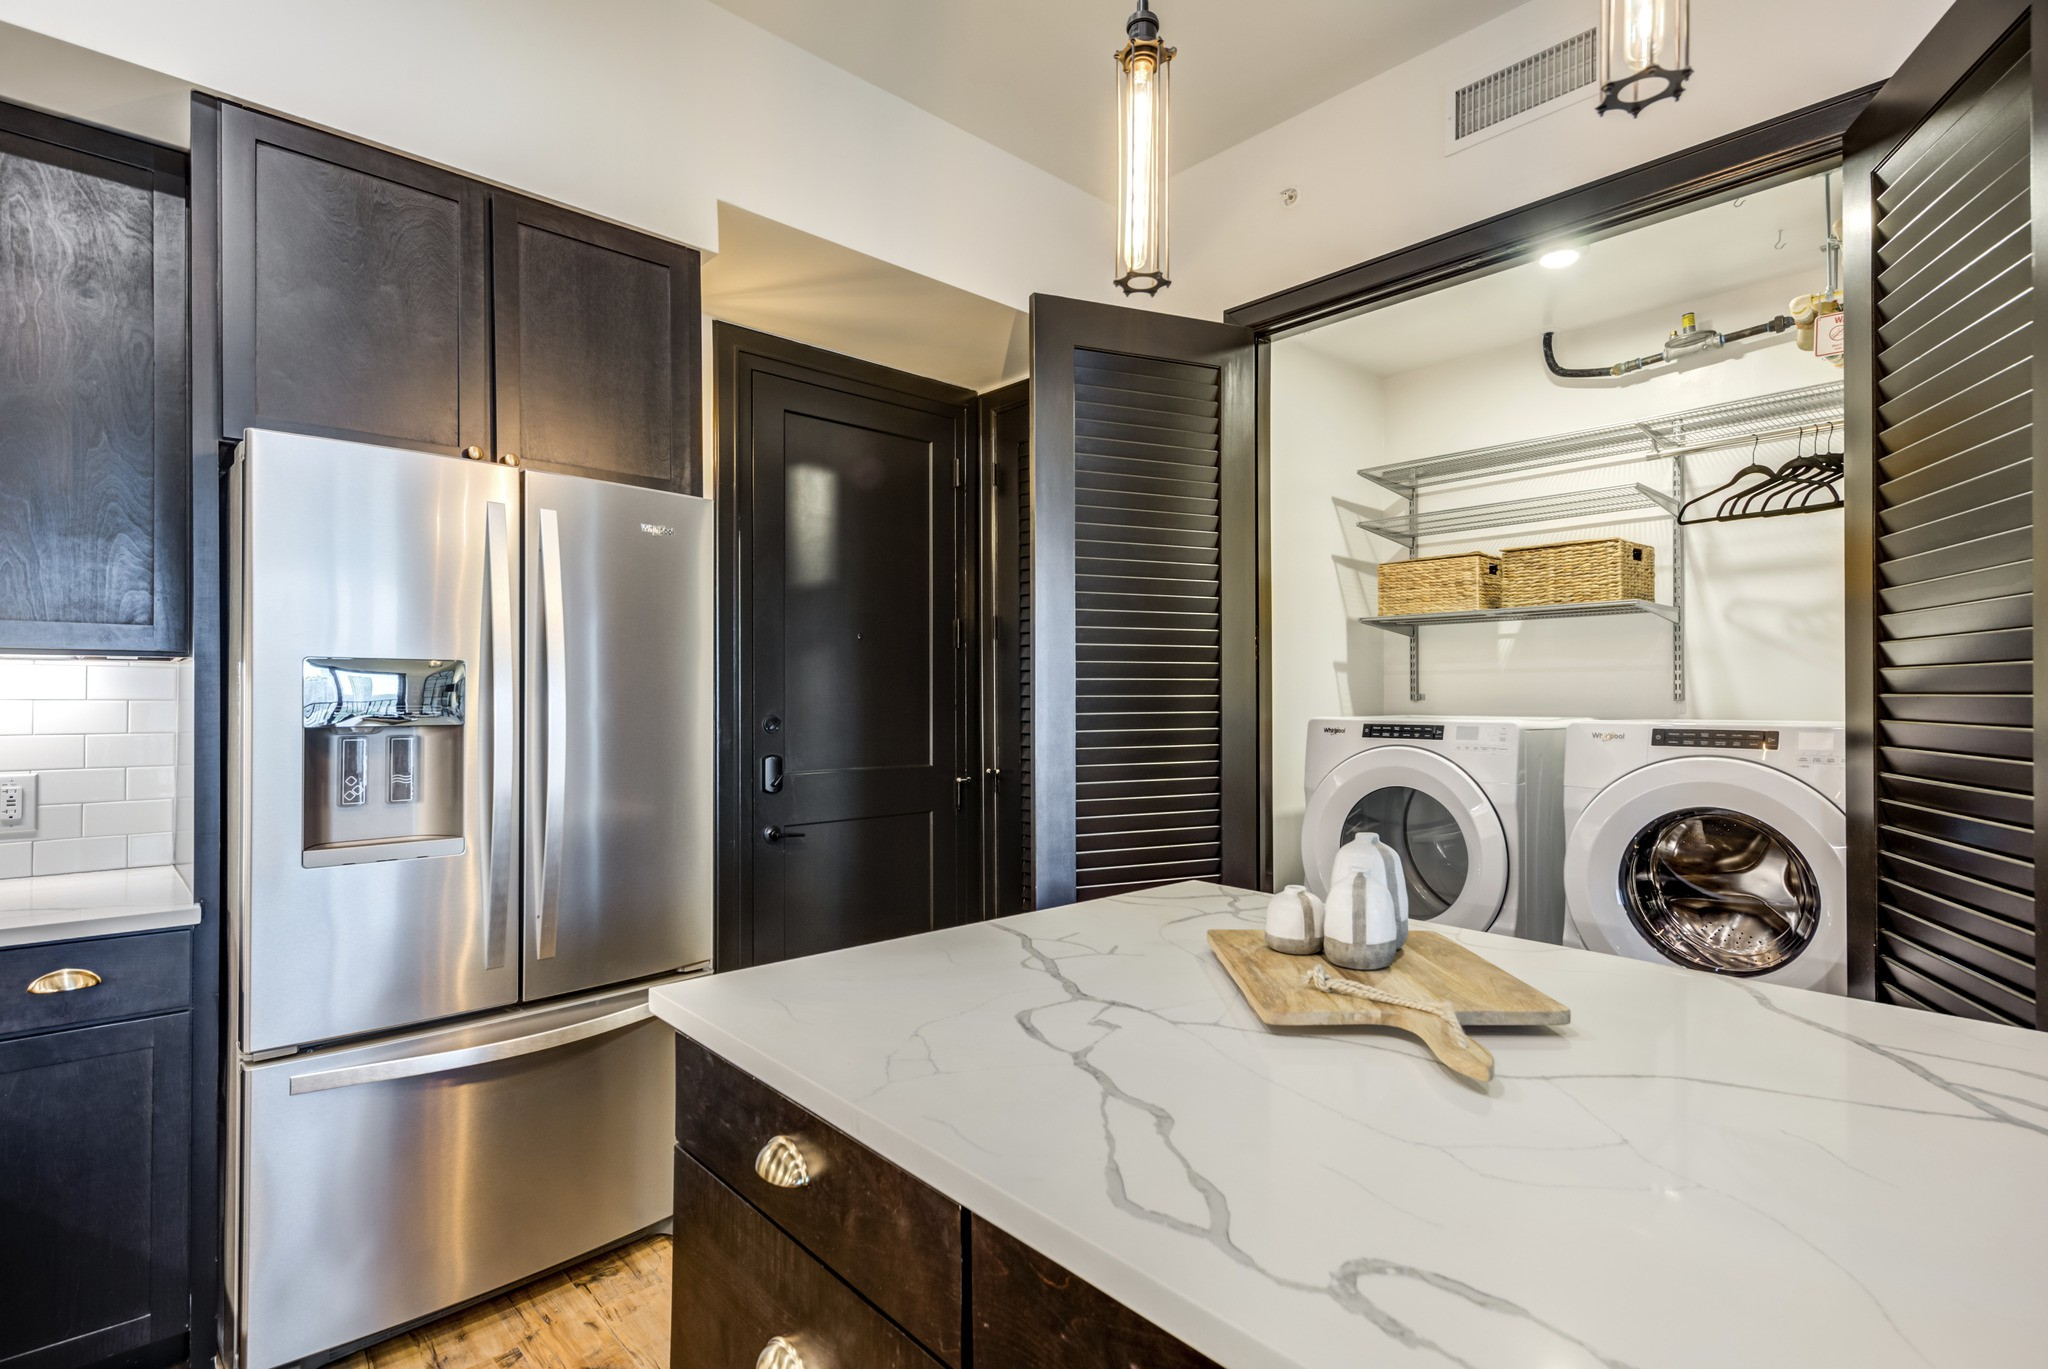 Apartments Near UT Austin Gables Republic Square for University of Texas - Austin Students in Austin, TX